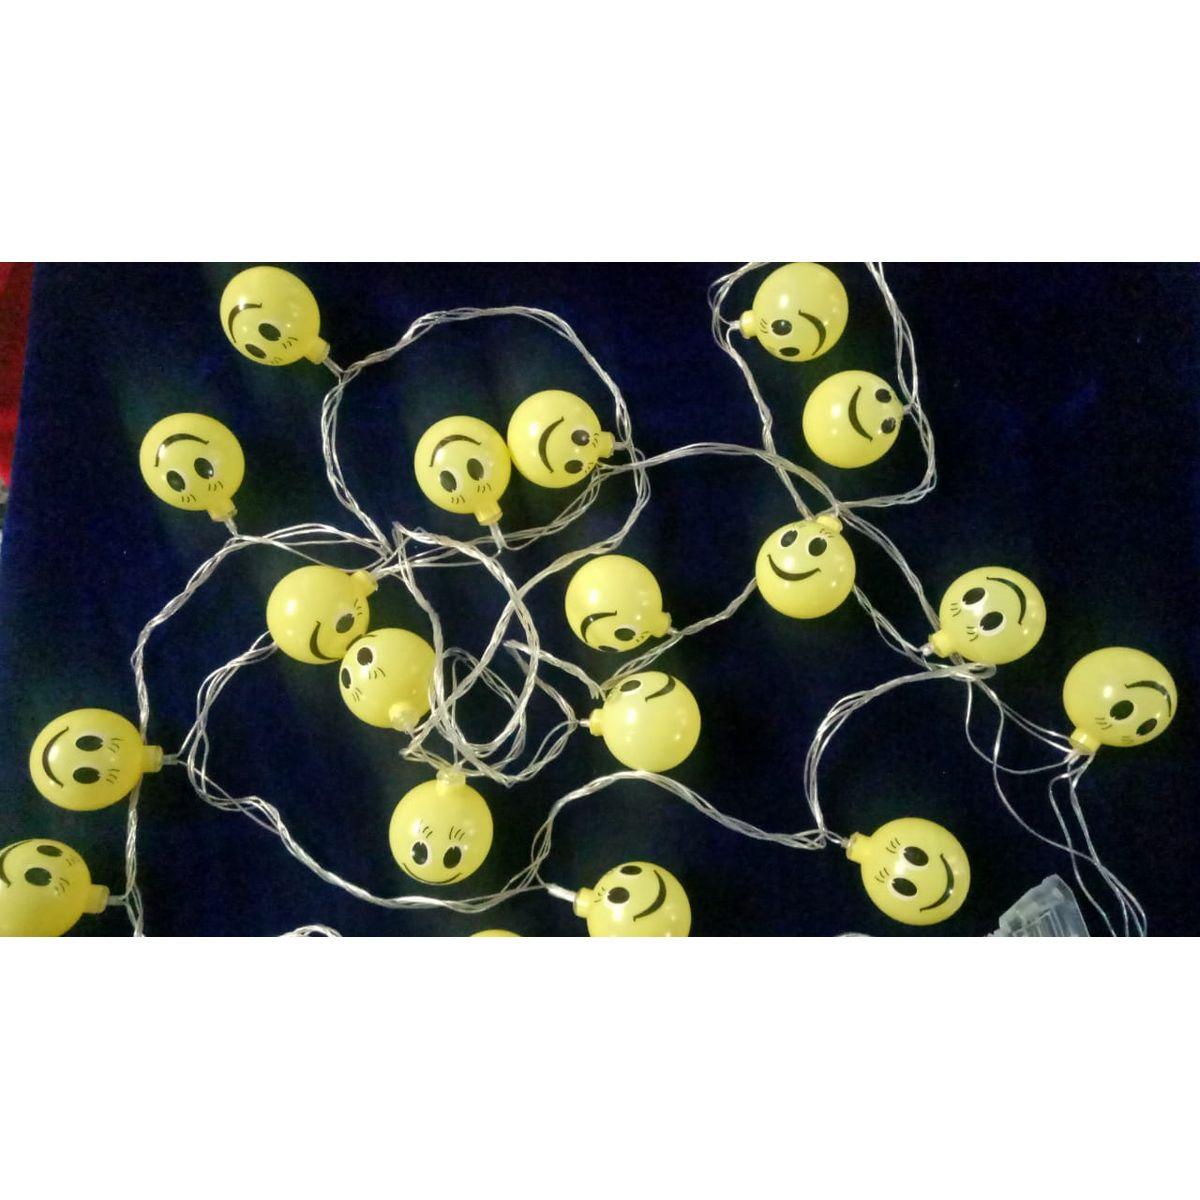 Smiley led emoji string light